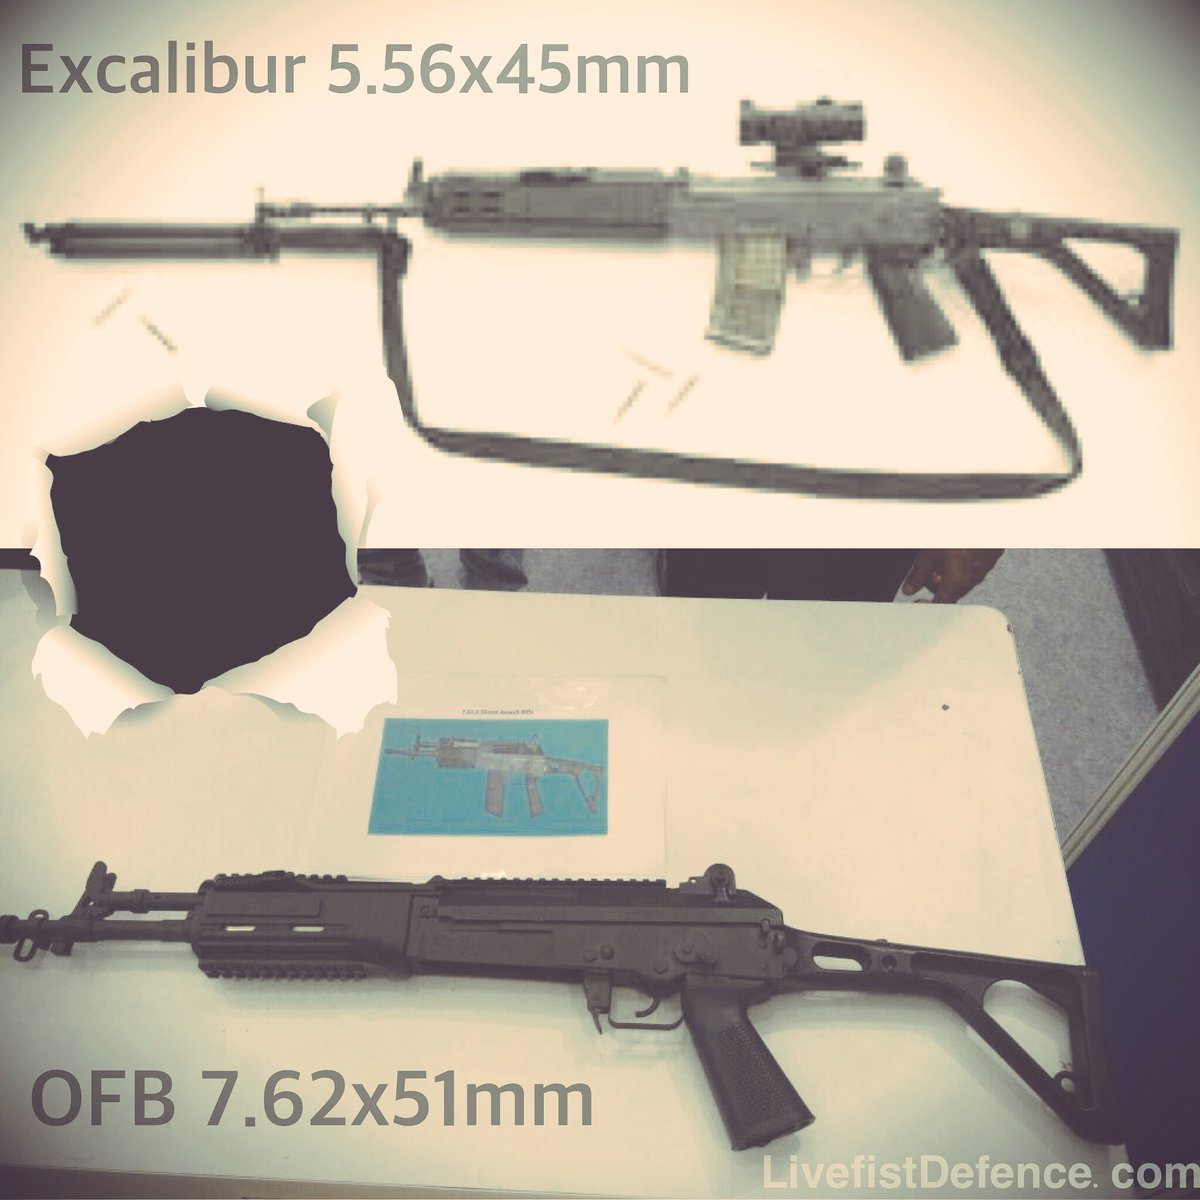 Livefist on twitter after rejecting drdoindia excalibur 556mm livefist on twitter after rejecting drdoindia excalibur 556mm rifle in 2016 indian army rejects ofb 762mm rifle now altavistaventures Images